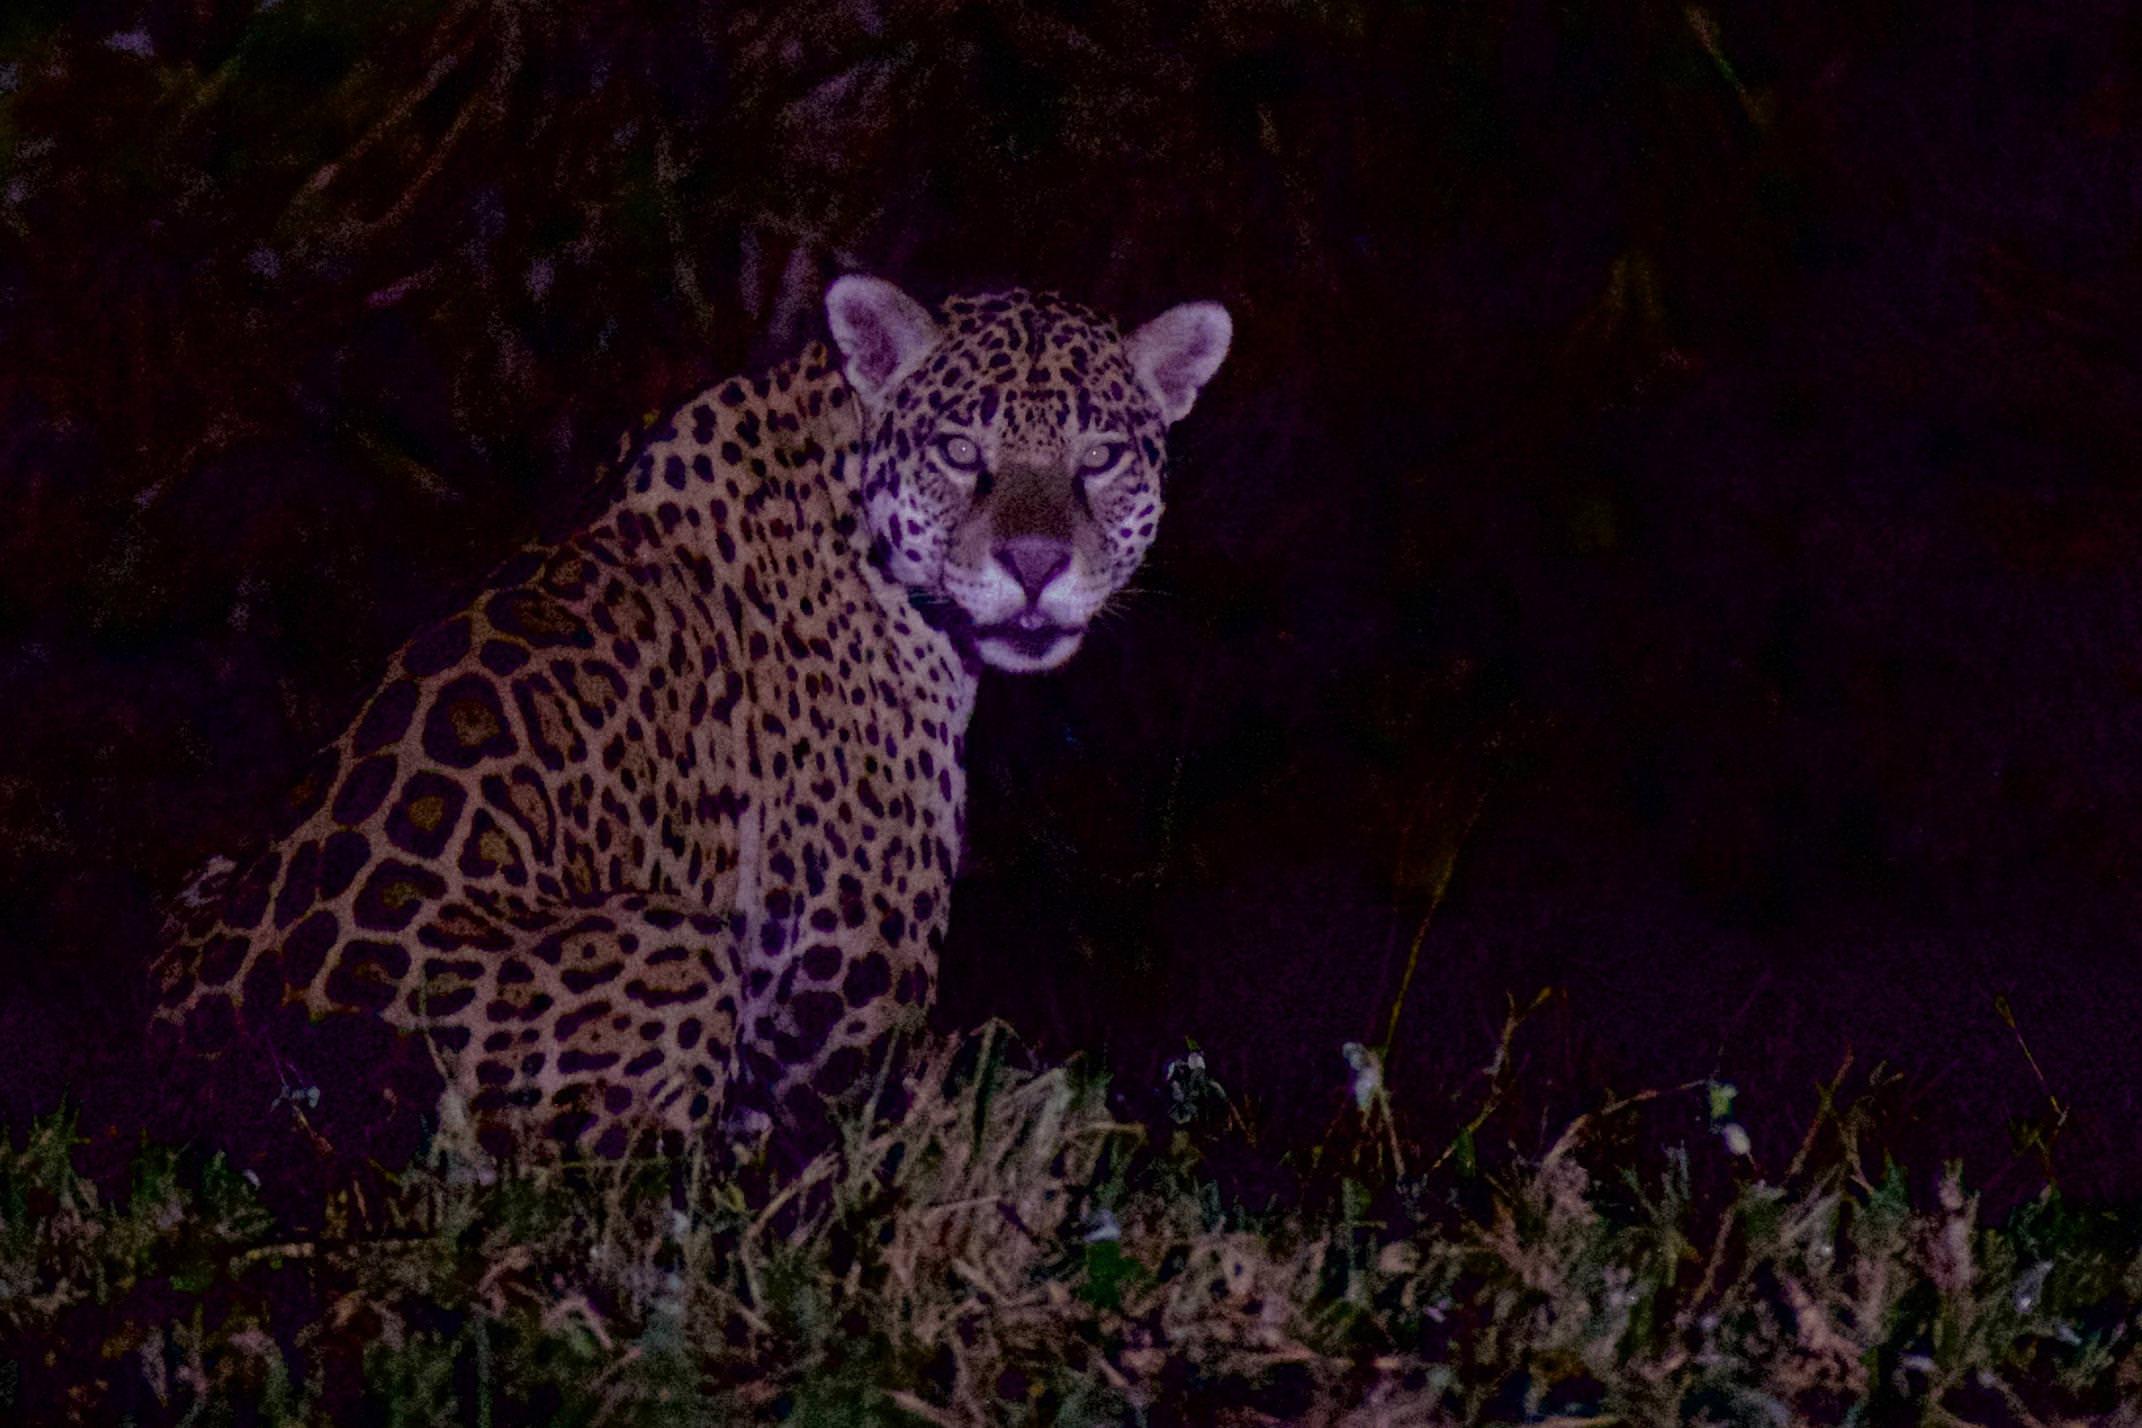 Brazil pantanal caiman lodge jaguar at night two copyright thomas power pura aventura